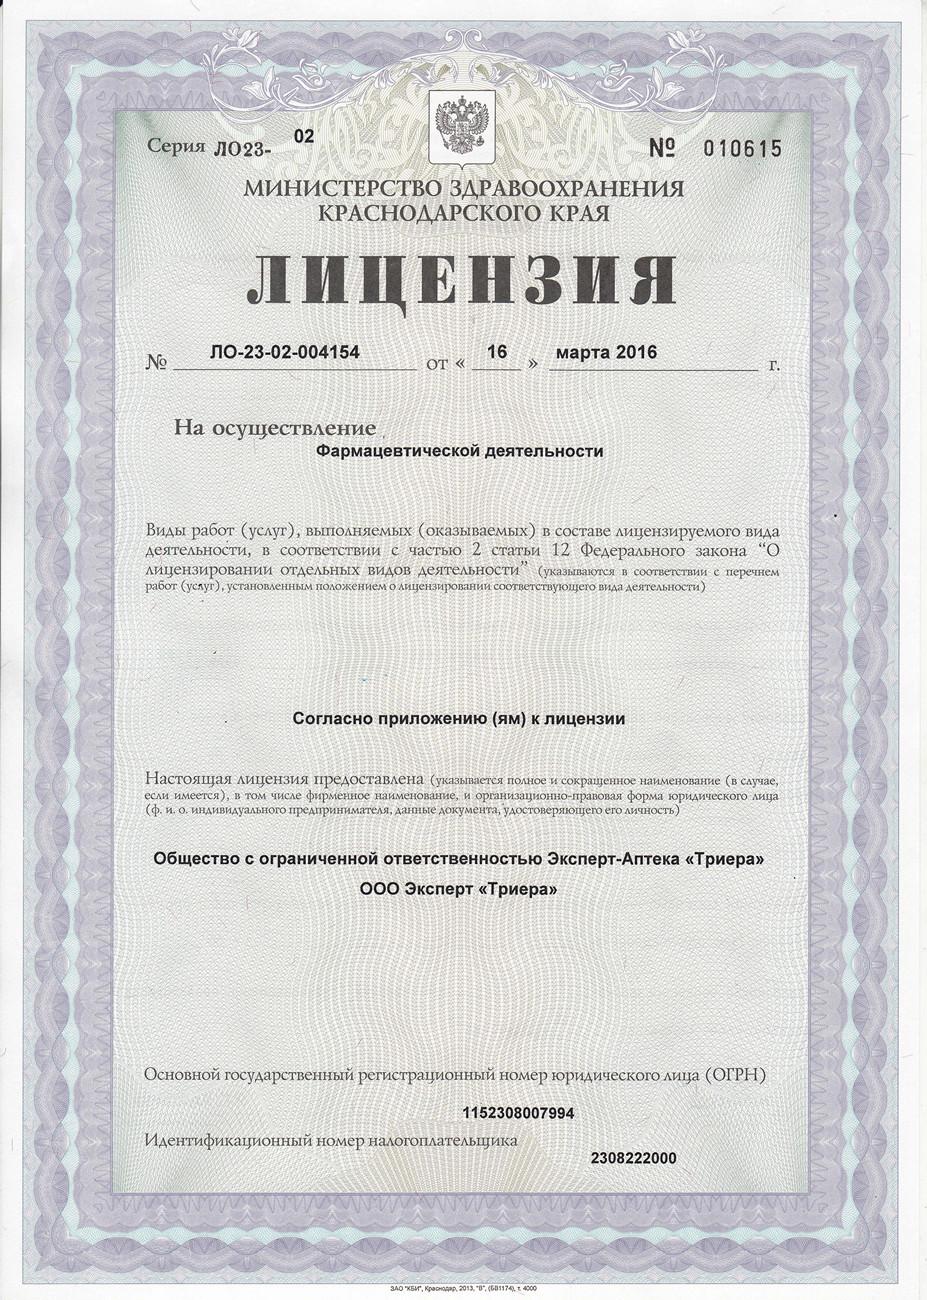 apteka-license-01